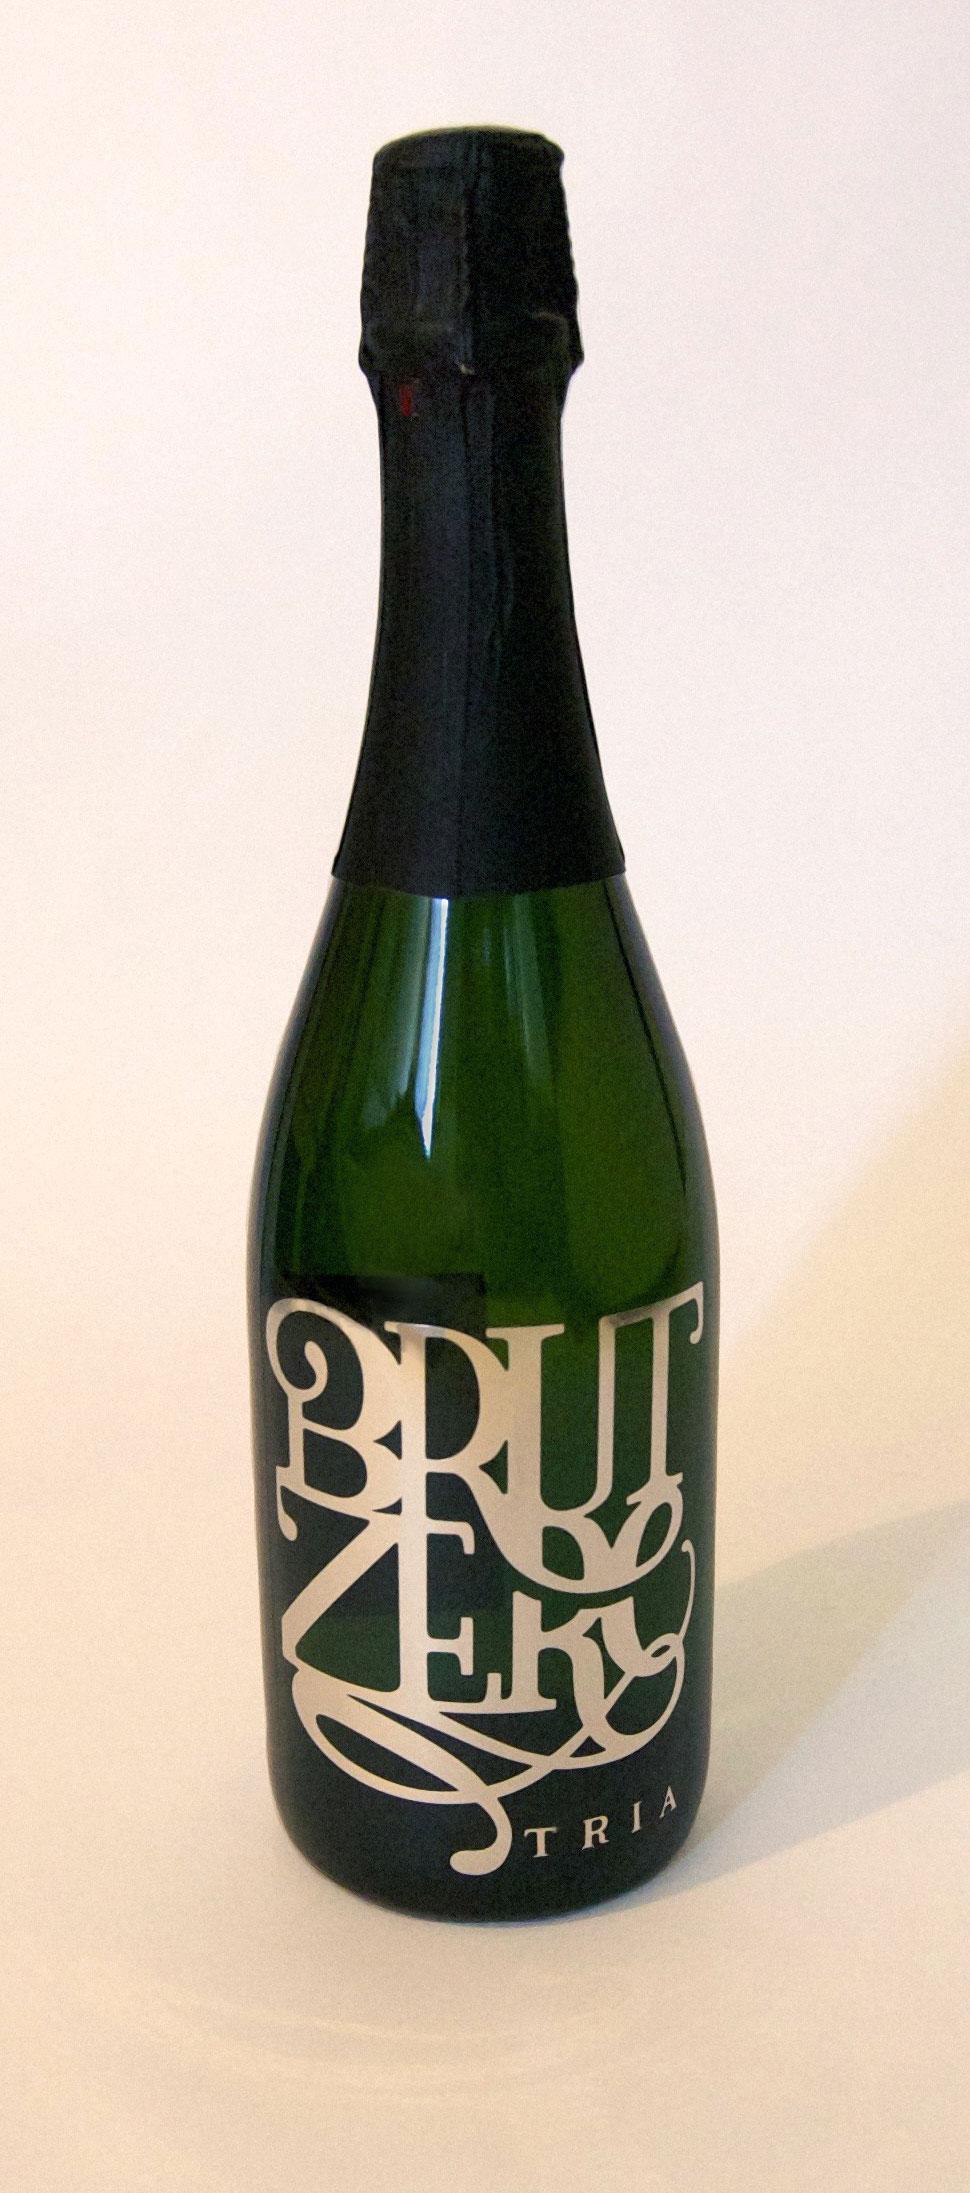 brutzero_bottle_wine_tria_bespoke.jpg